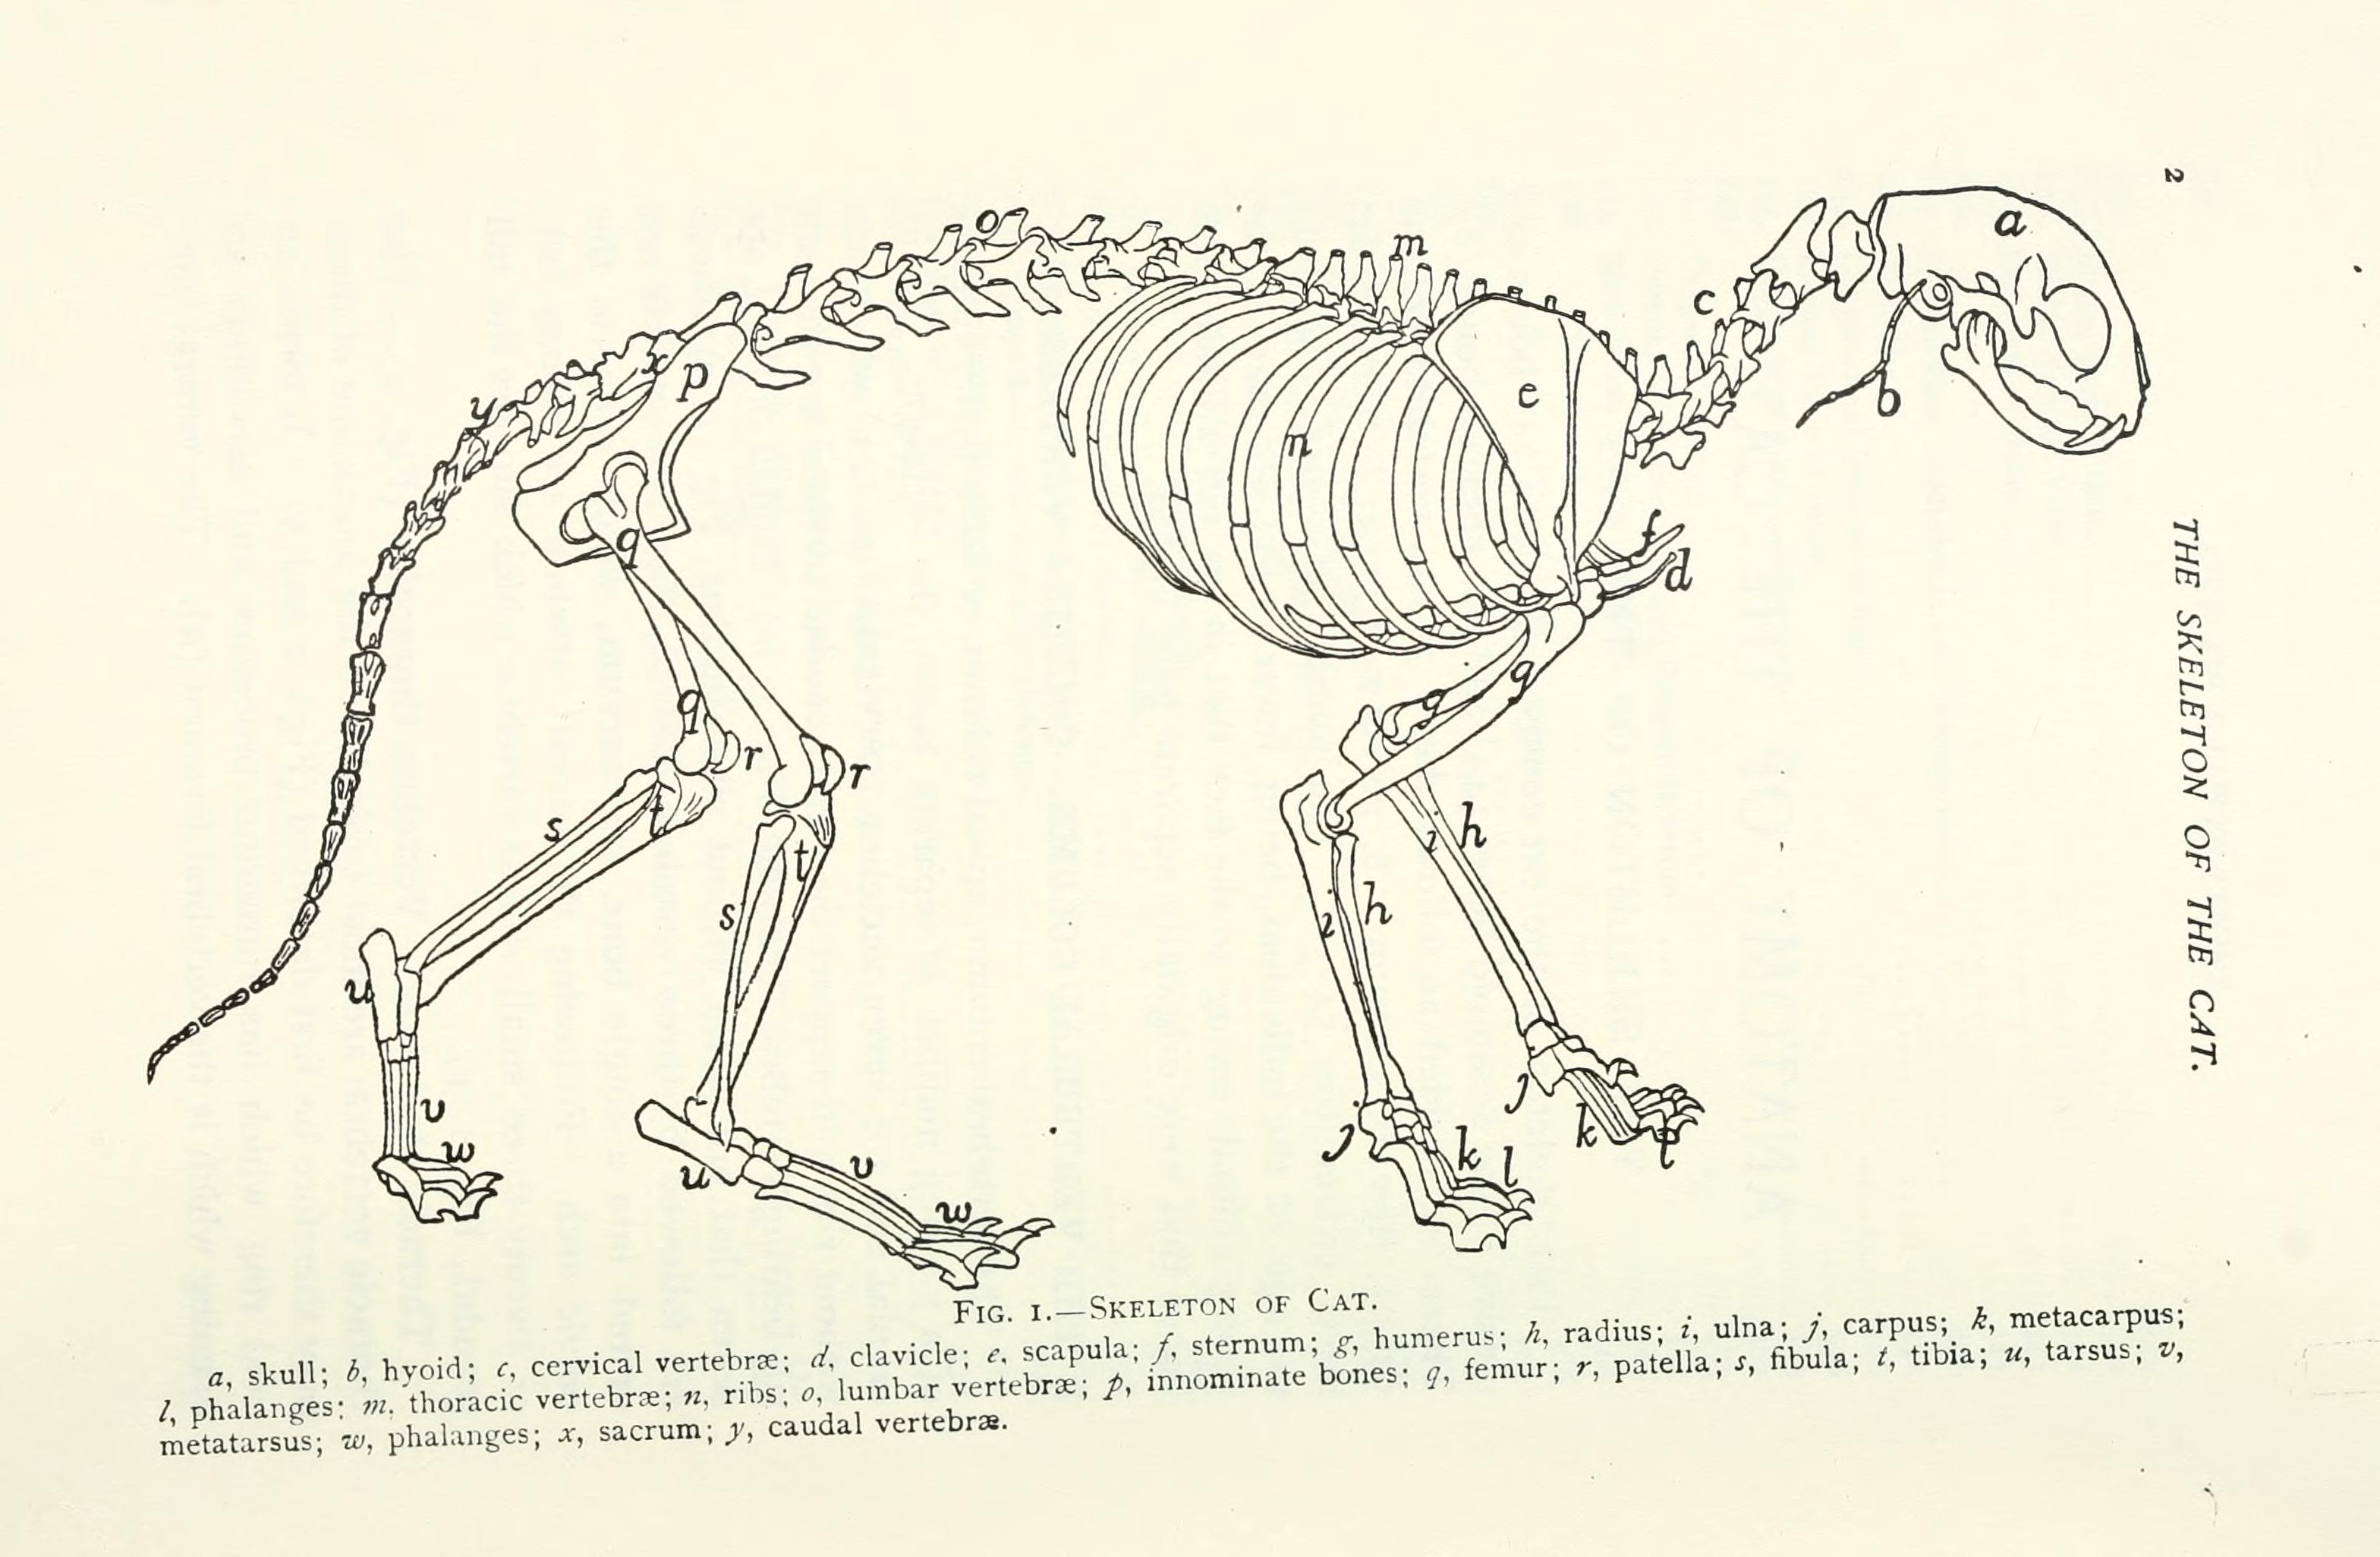 File:Anatomy of the cat BHL9413033.jpg - Wikimedia Commons